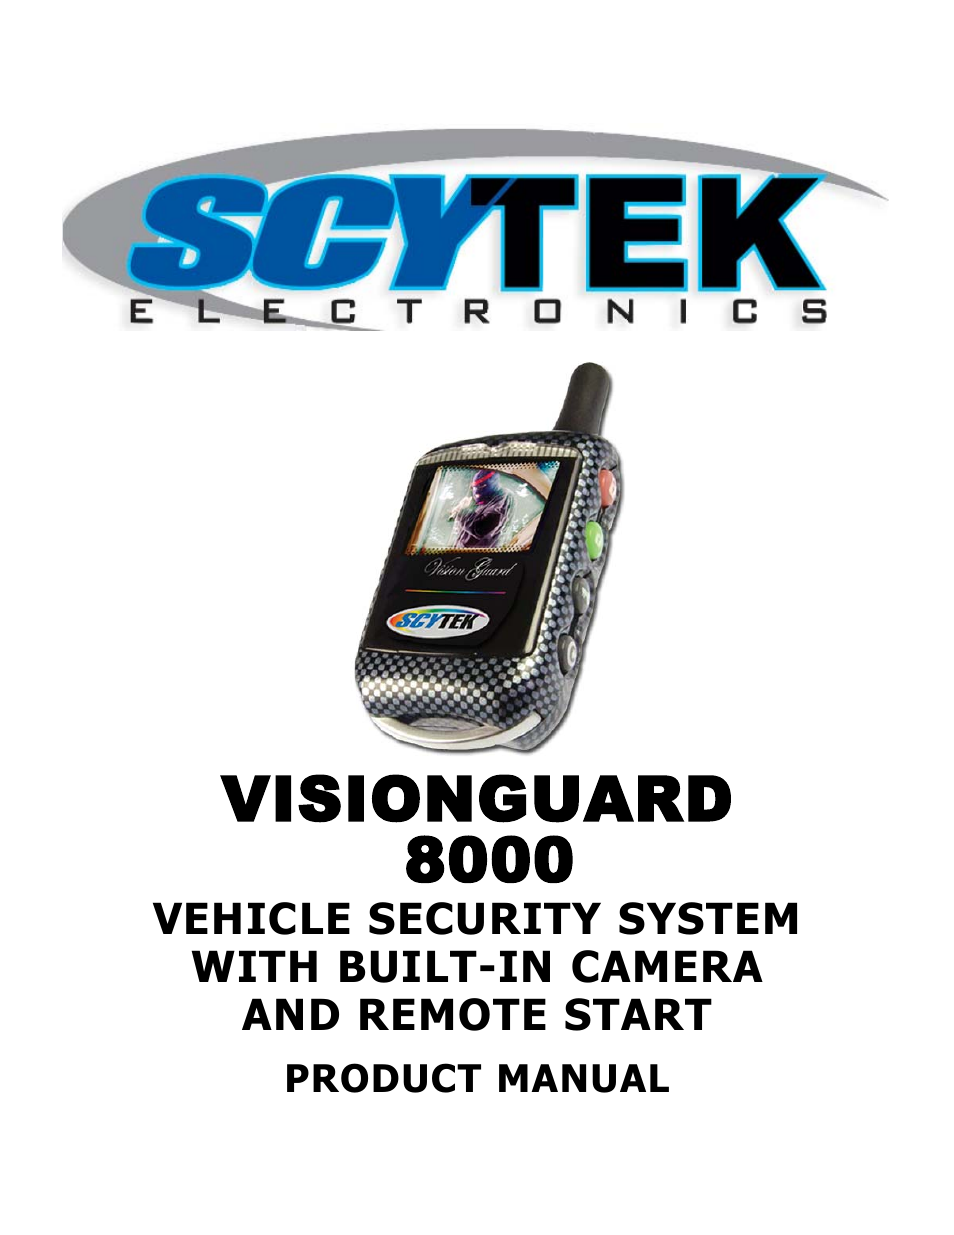 scytek electronics visionguard 8000 user manual